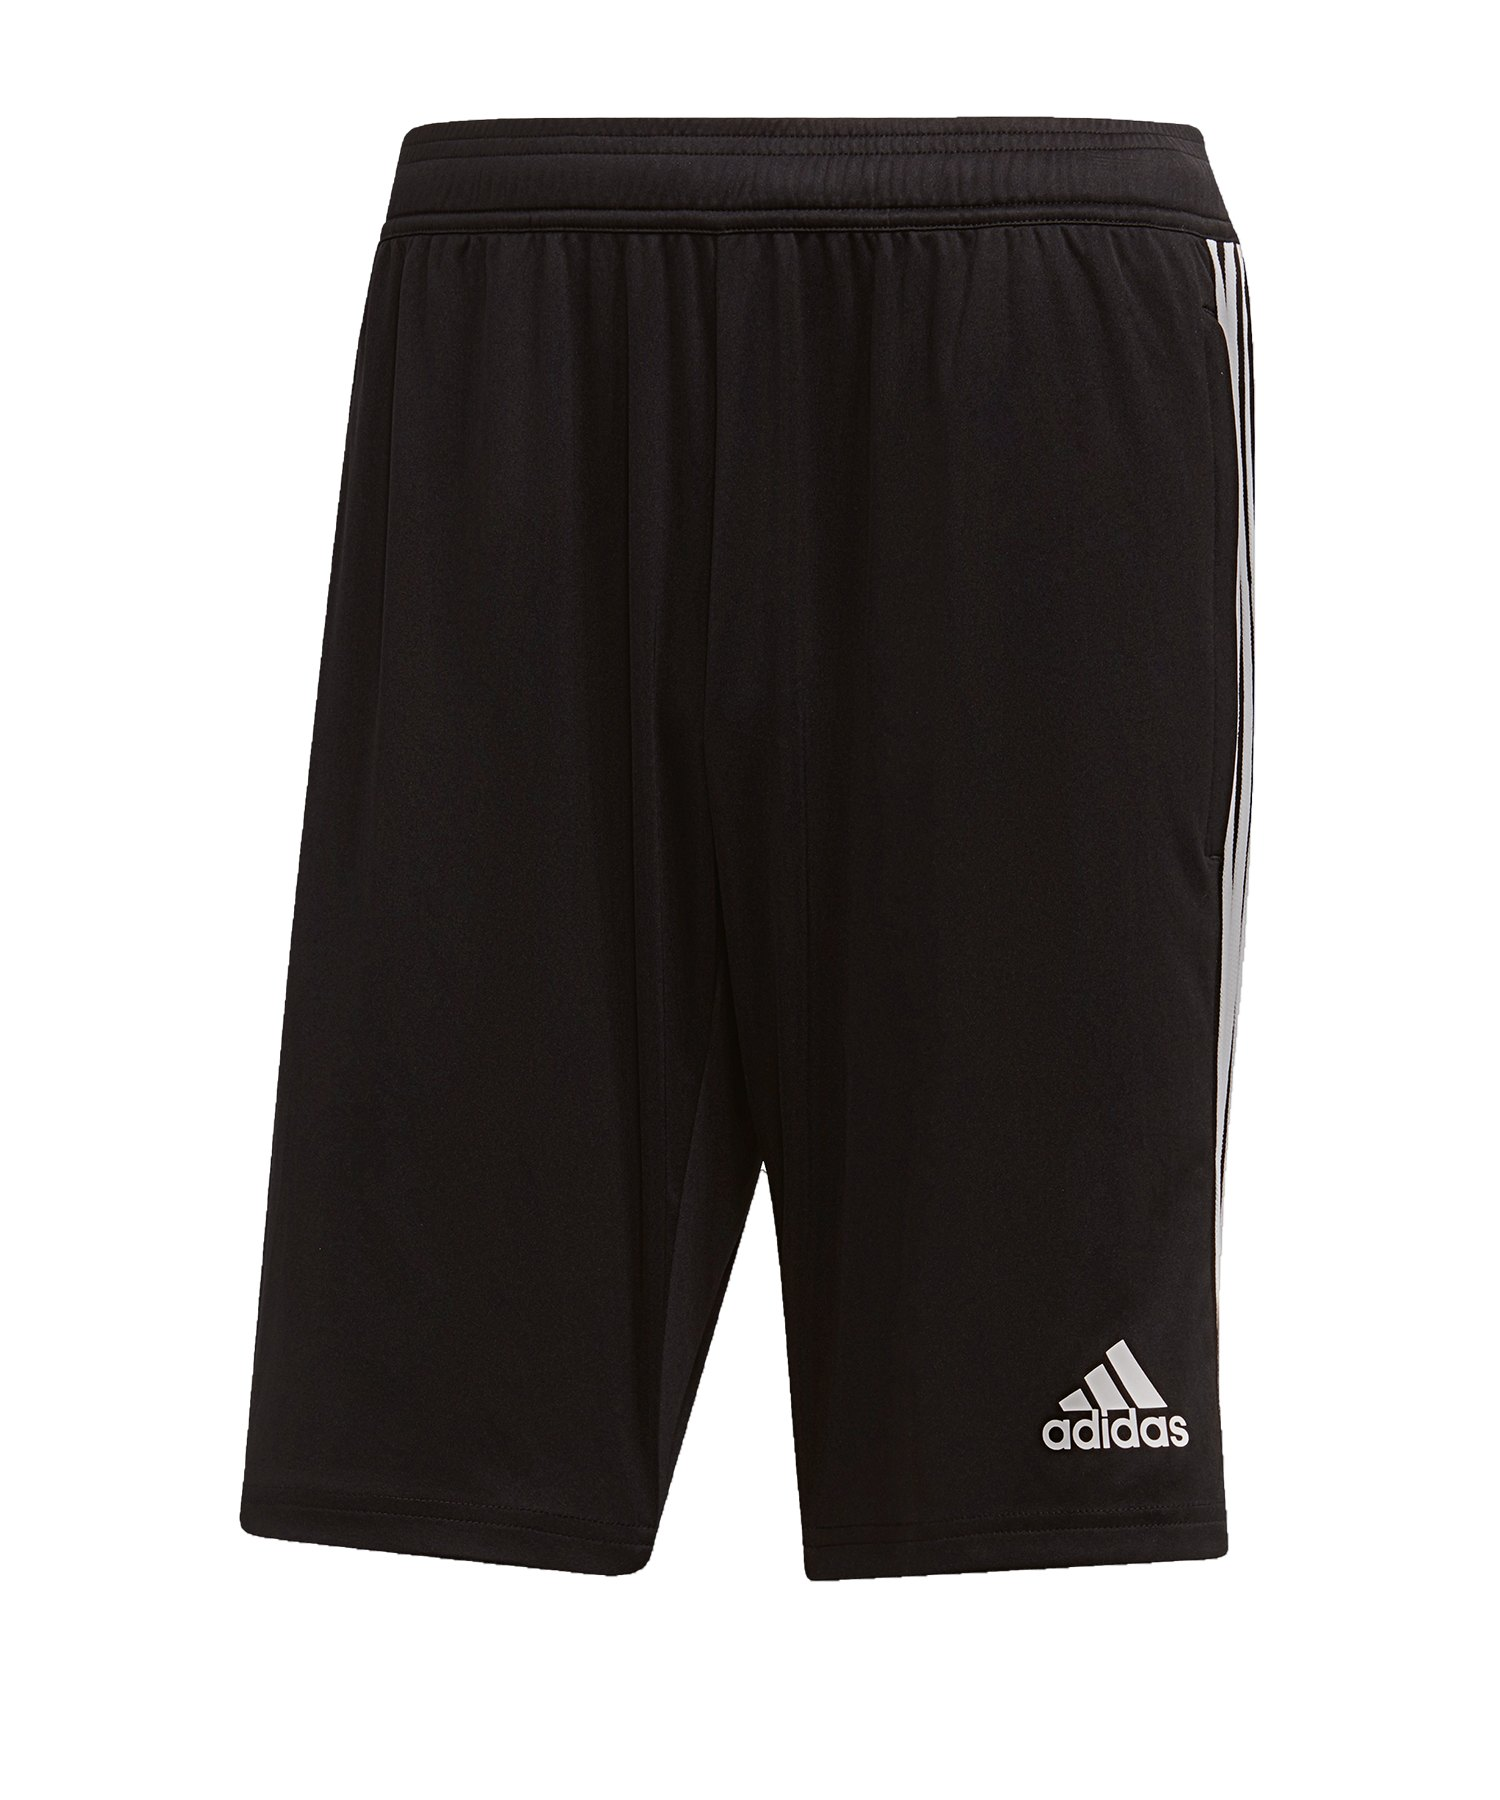 adidas tiro 19 kinder polyester pants schwarz-weiß